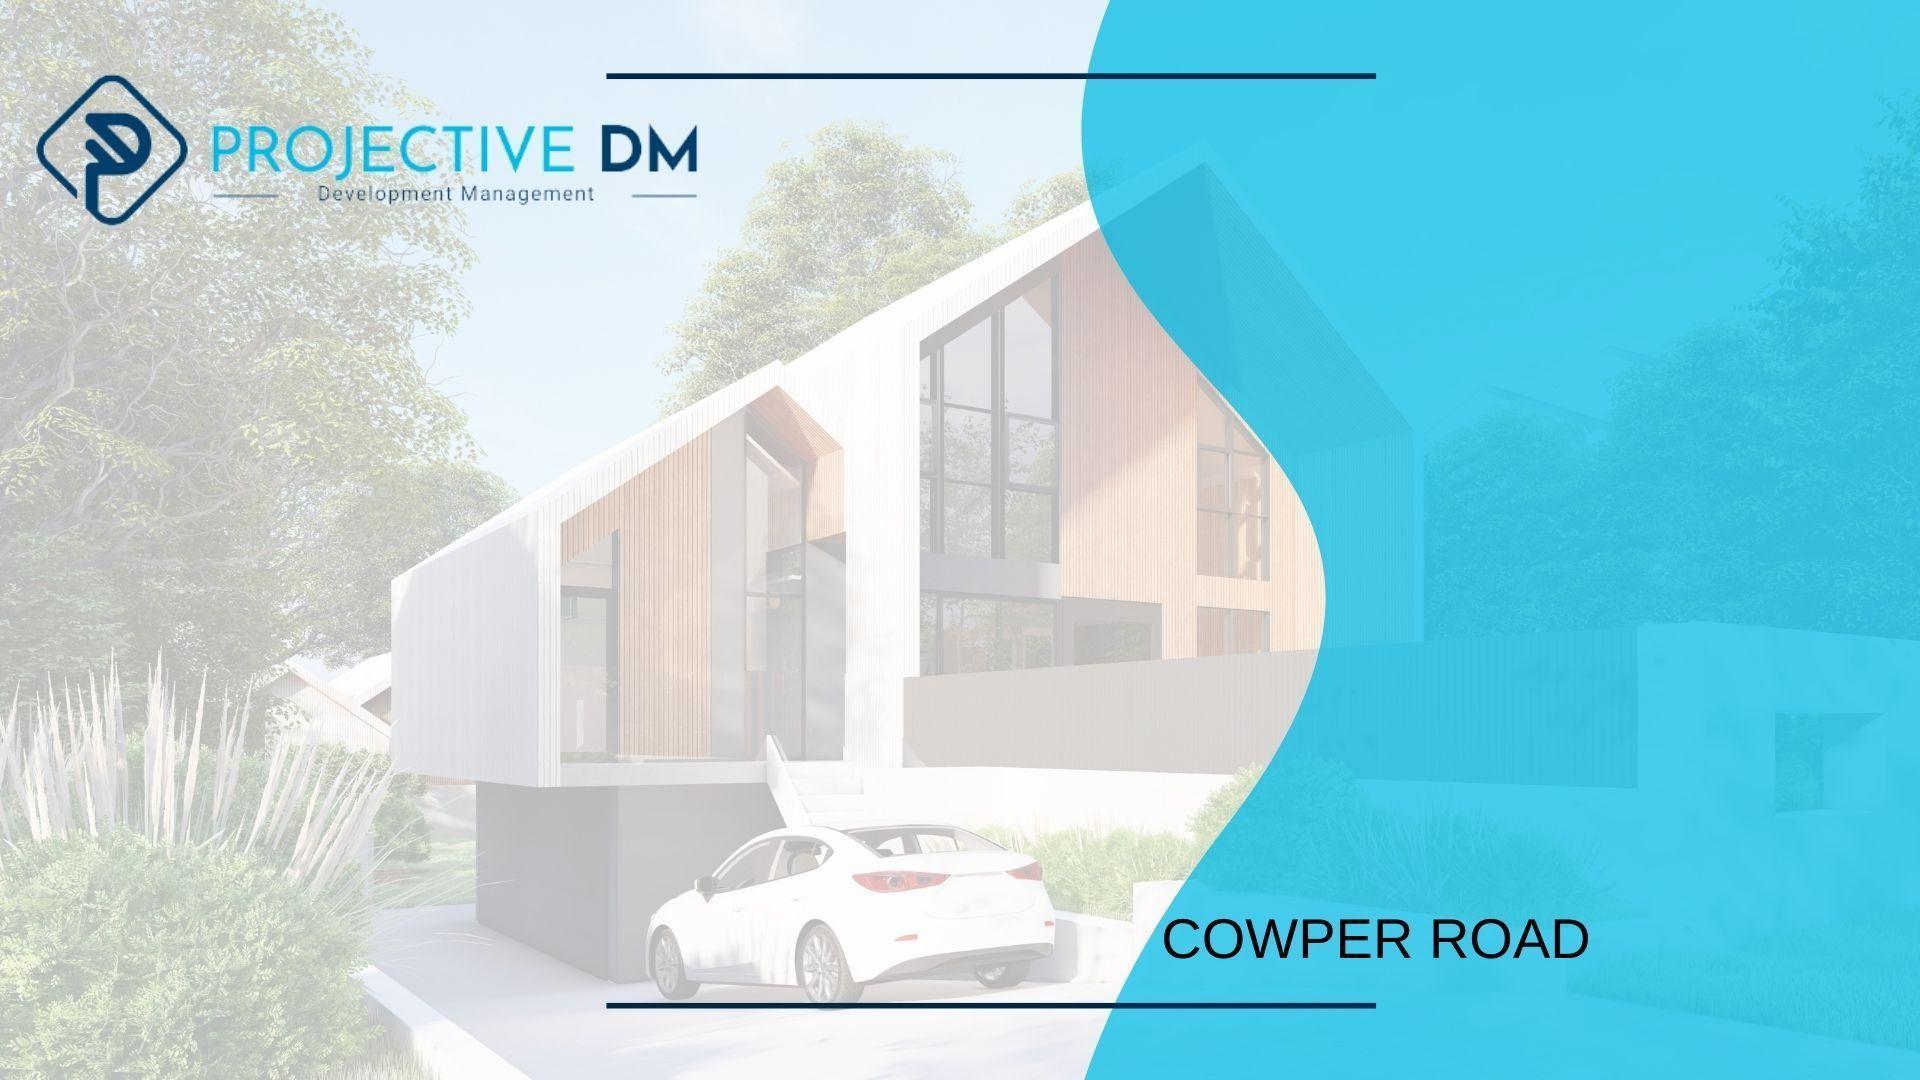 7 bedrooms House in 18 Cowper Rd SORRENTO WA, 6020